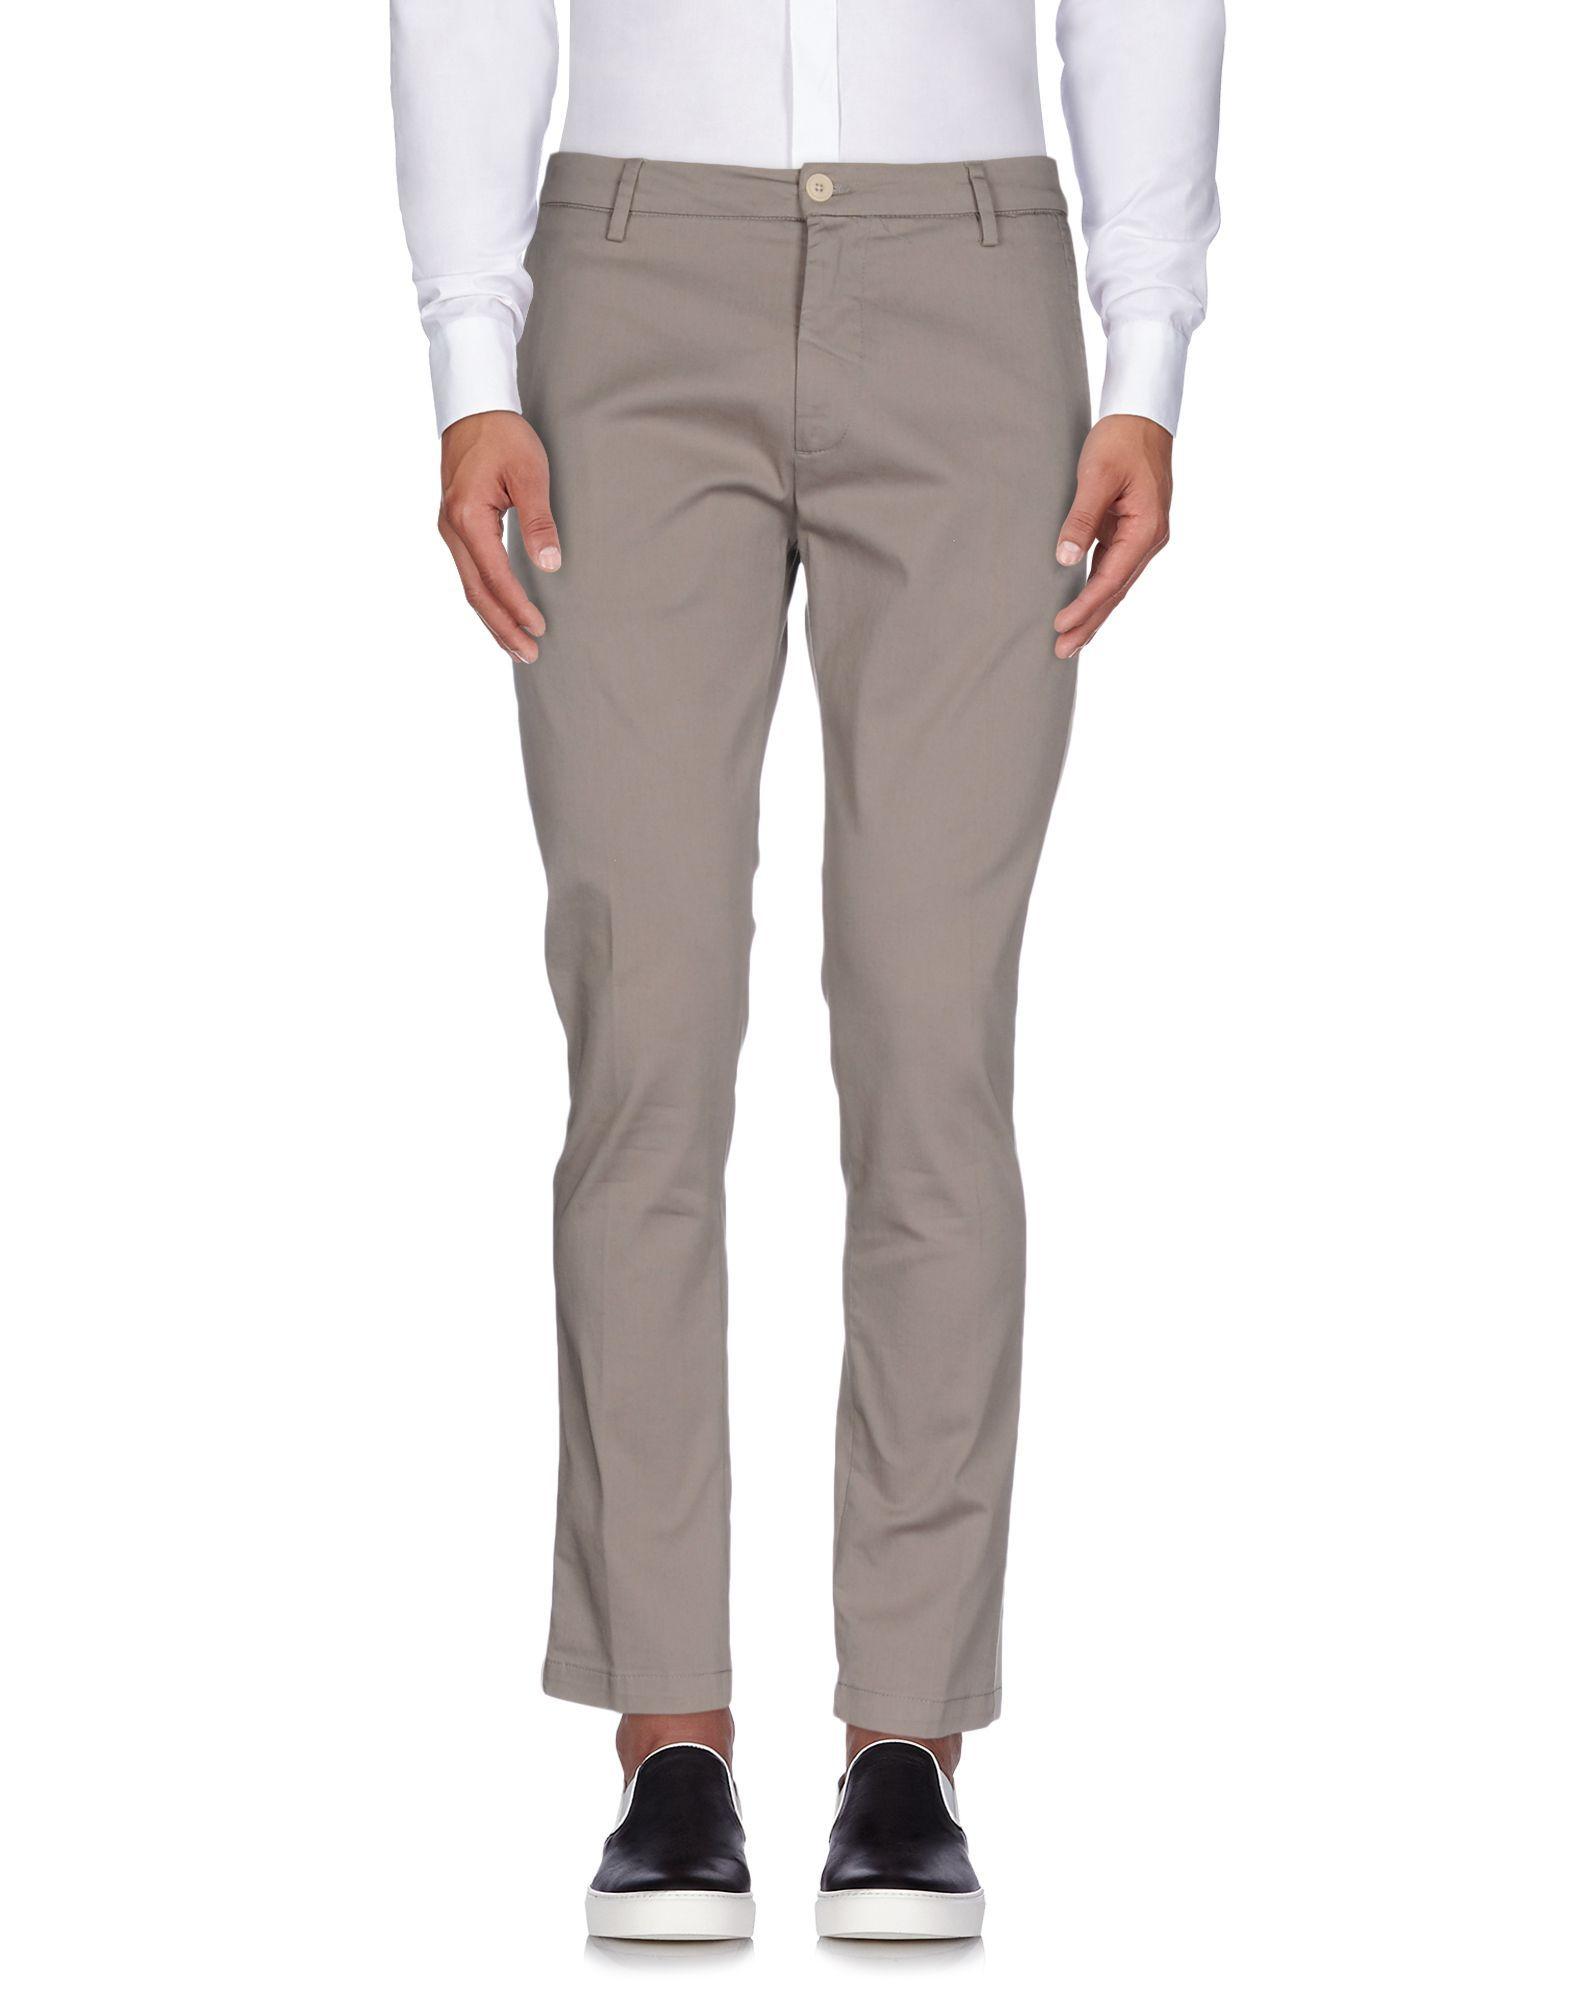 TROUSERS Low Brand Grey Man Cotton